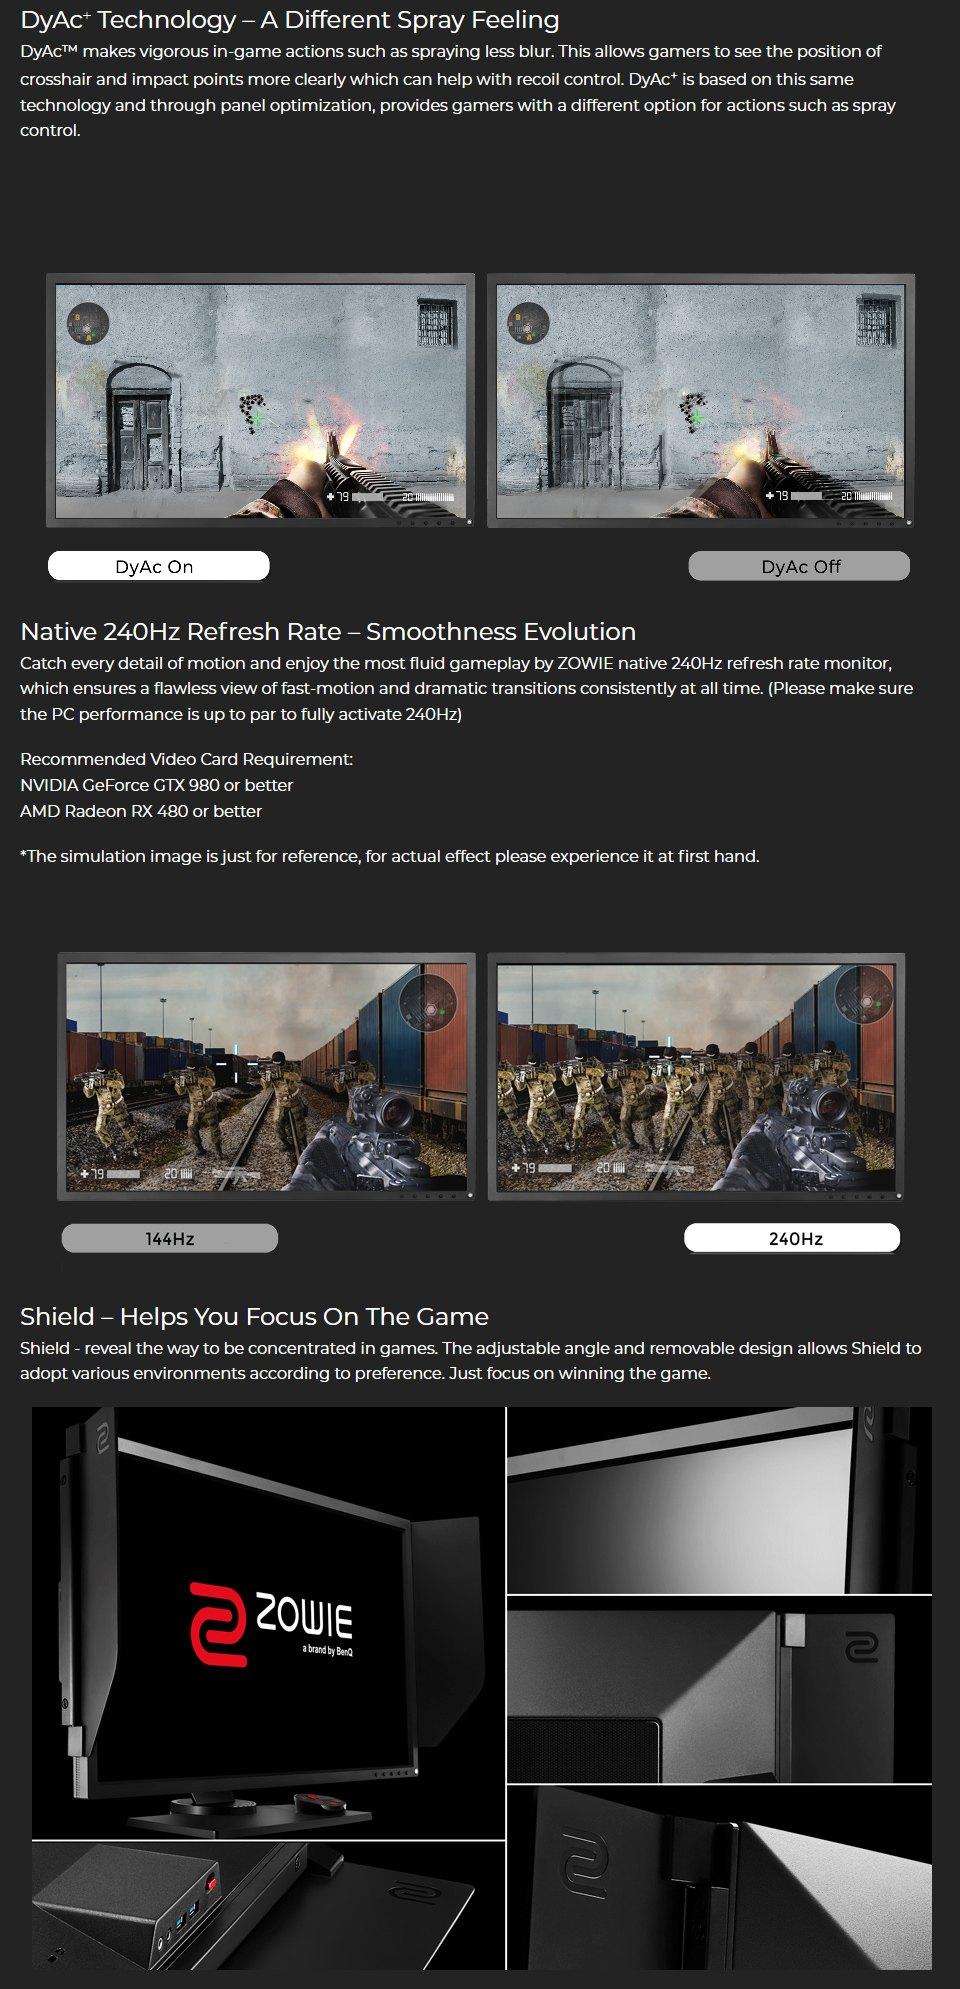 BenQ Zowie XL2746S FHD 240Hz DyAc+ 27in e-Sports Monitor features